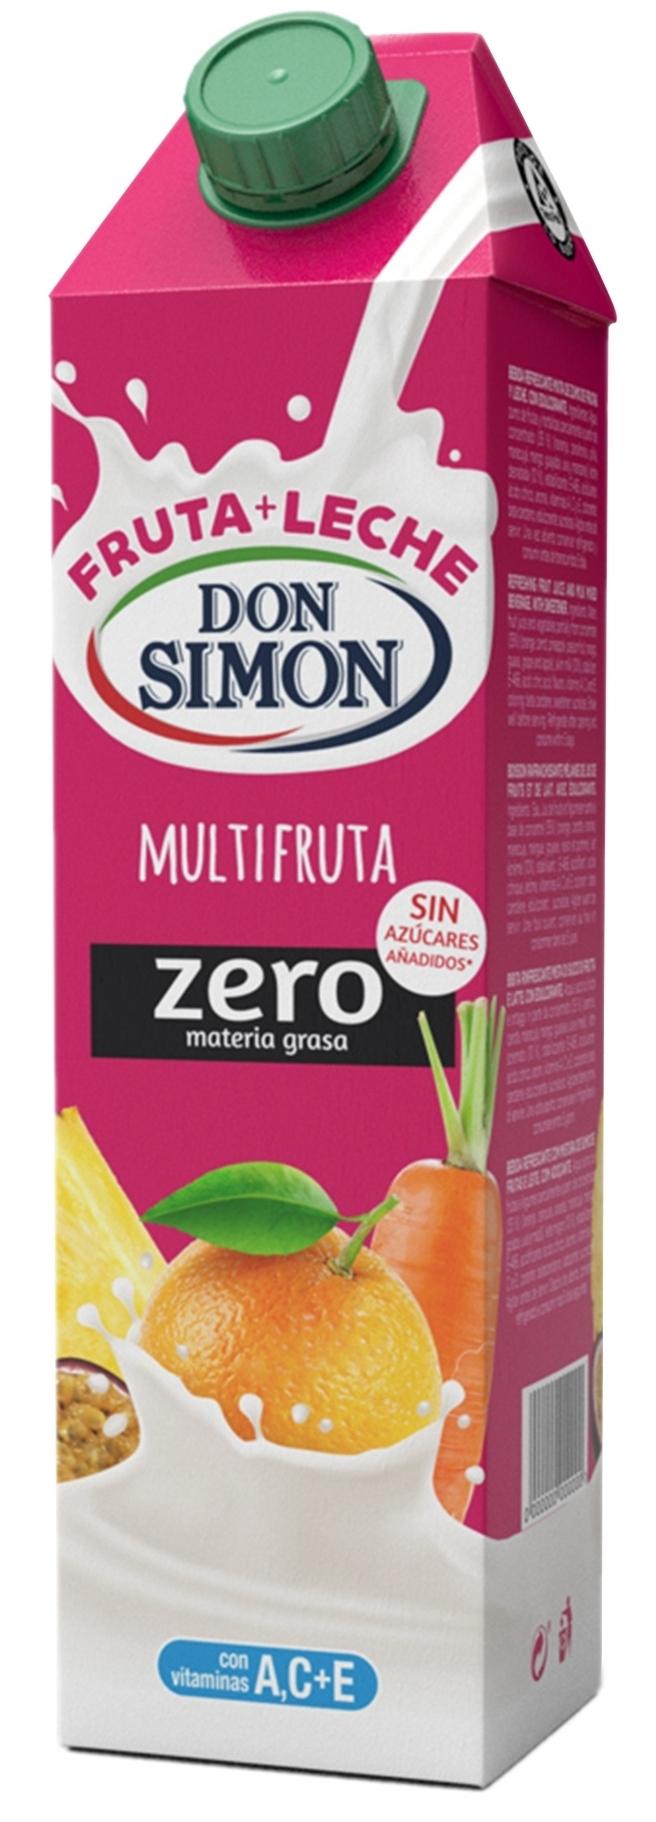 Fruta-leche multifruta